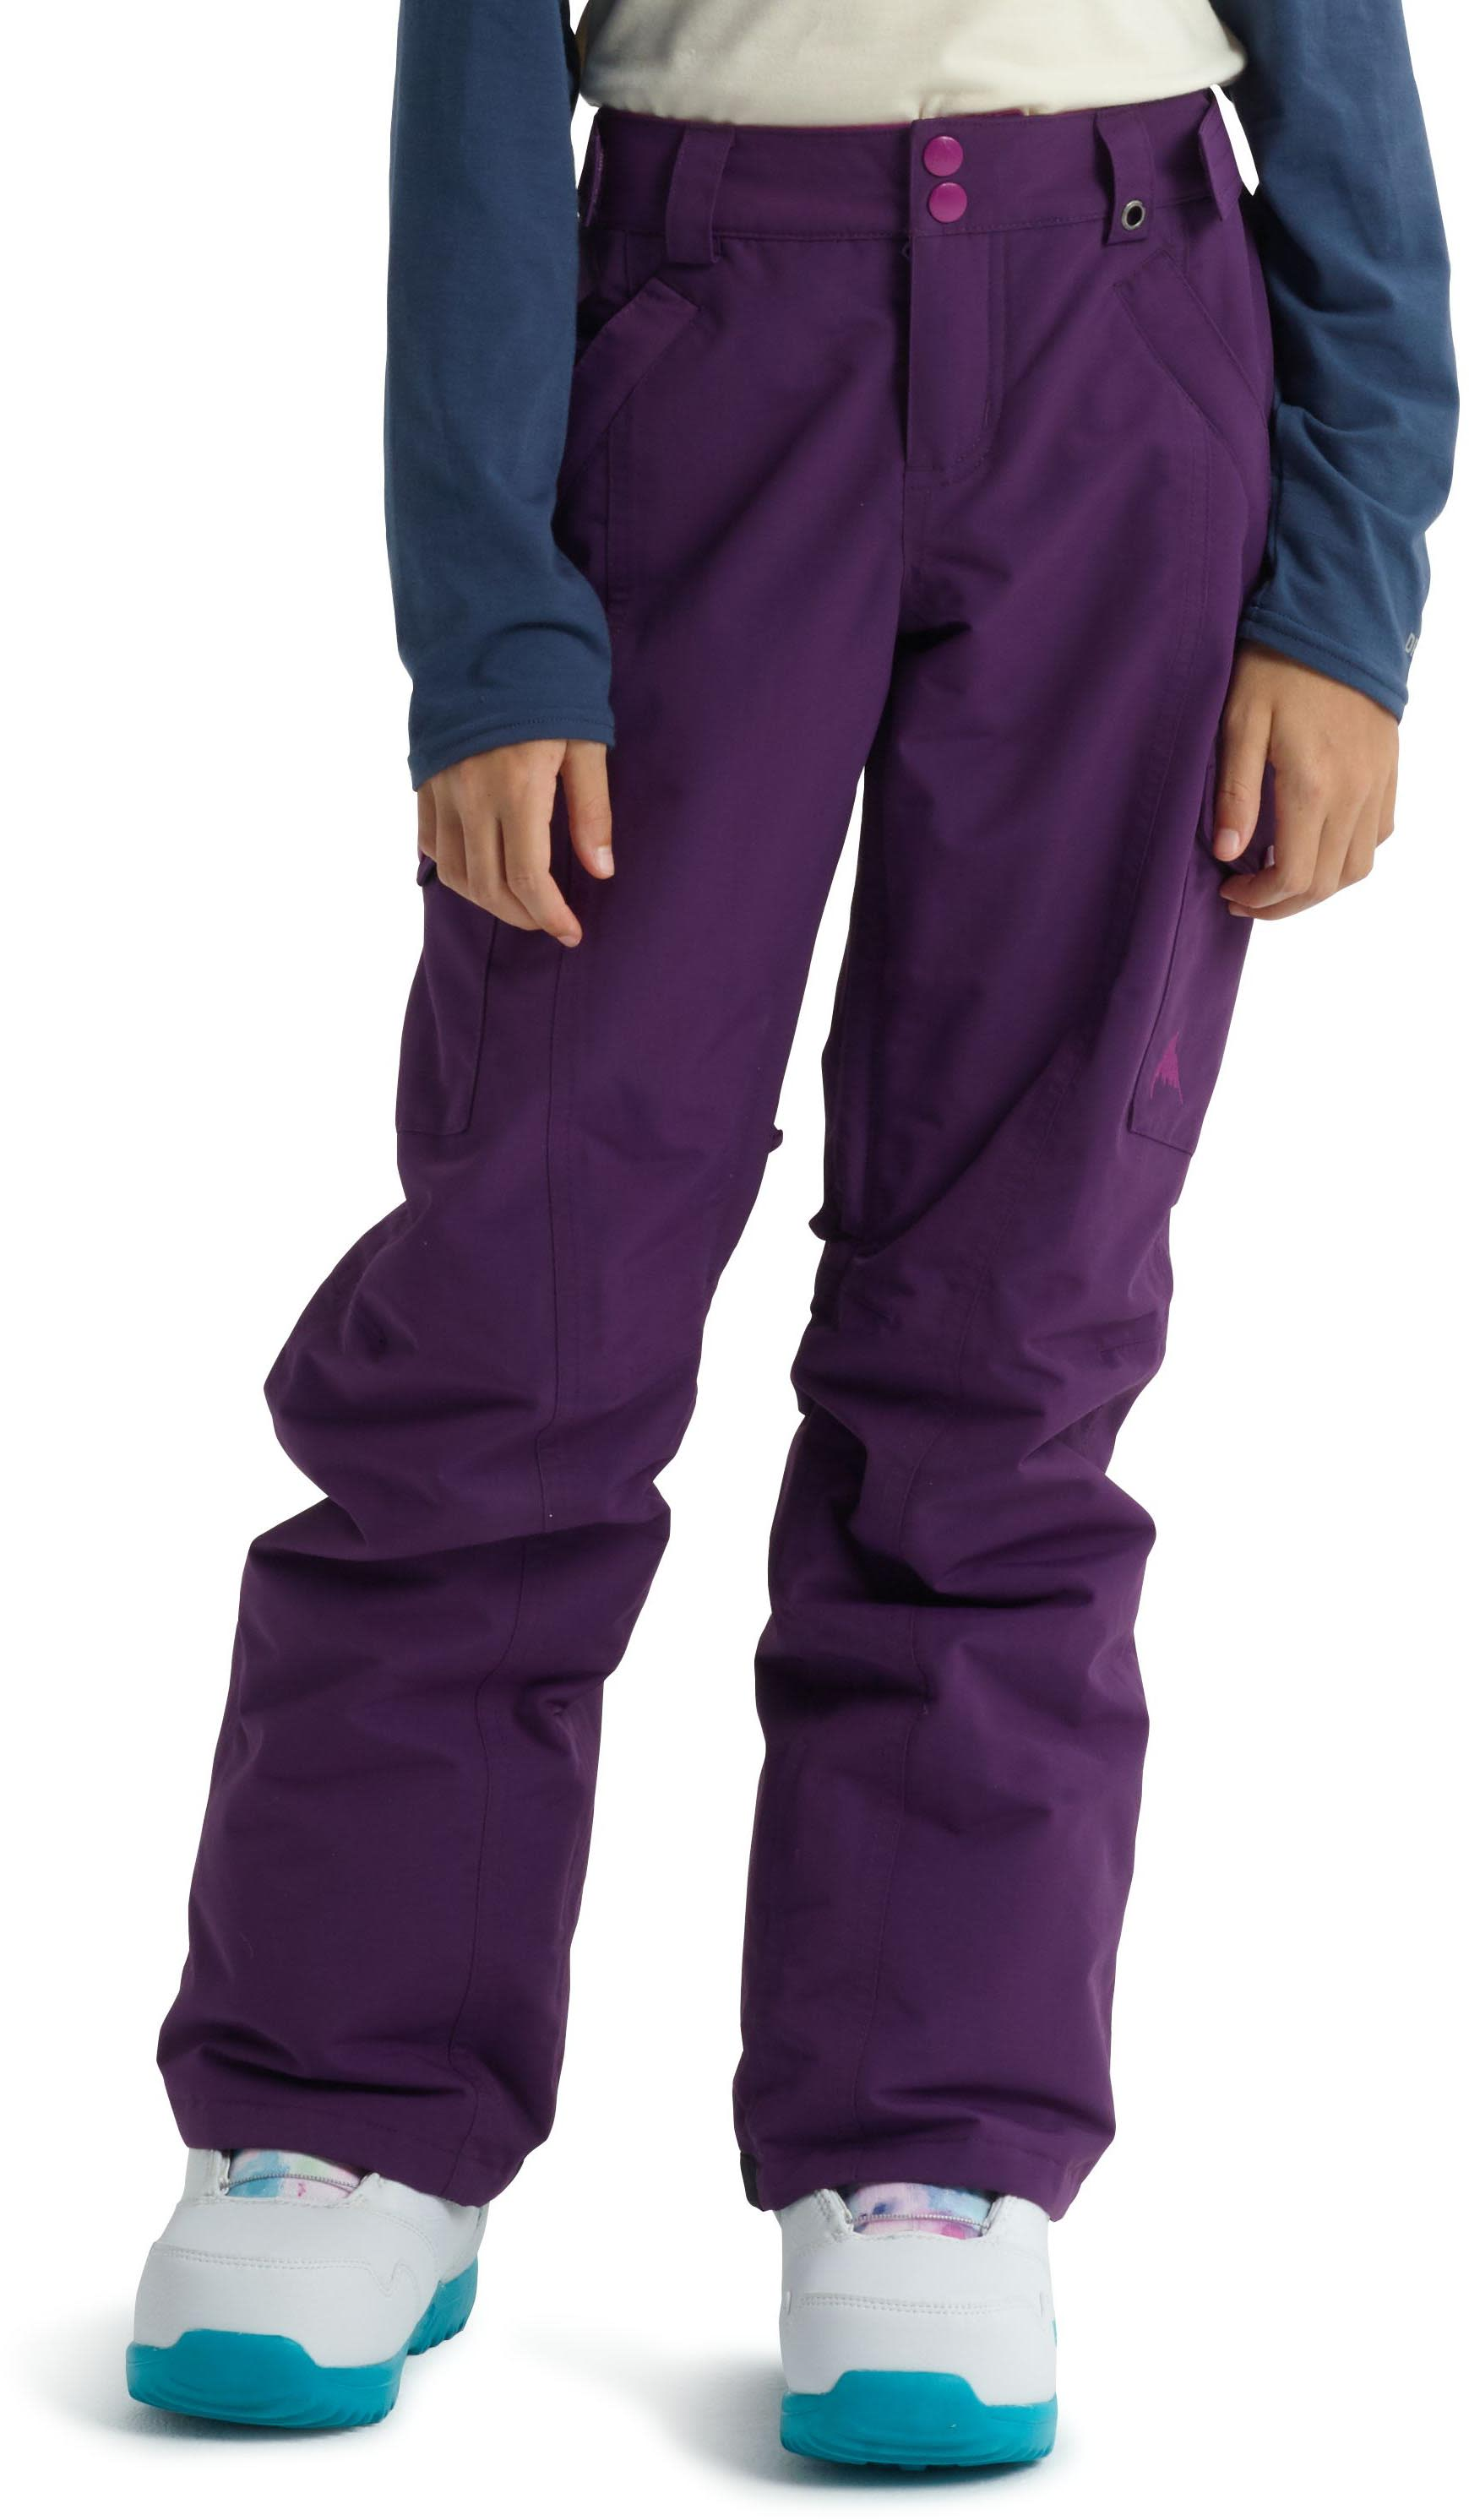 eeeb752720 Burton Elite Cargo Snowboard Pants - Girls 2019